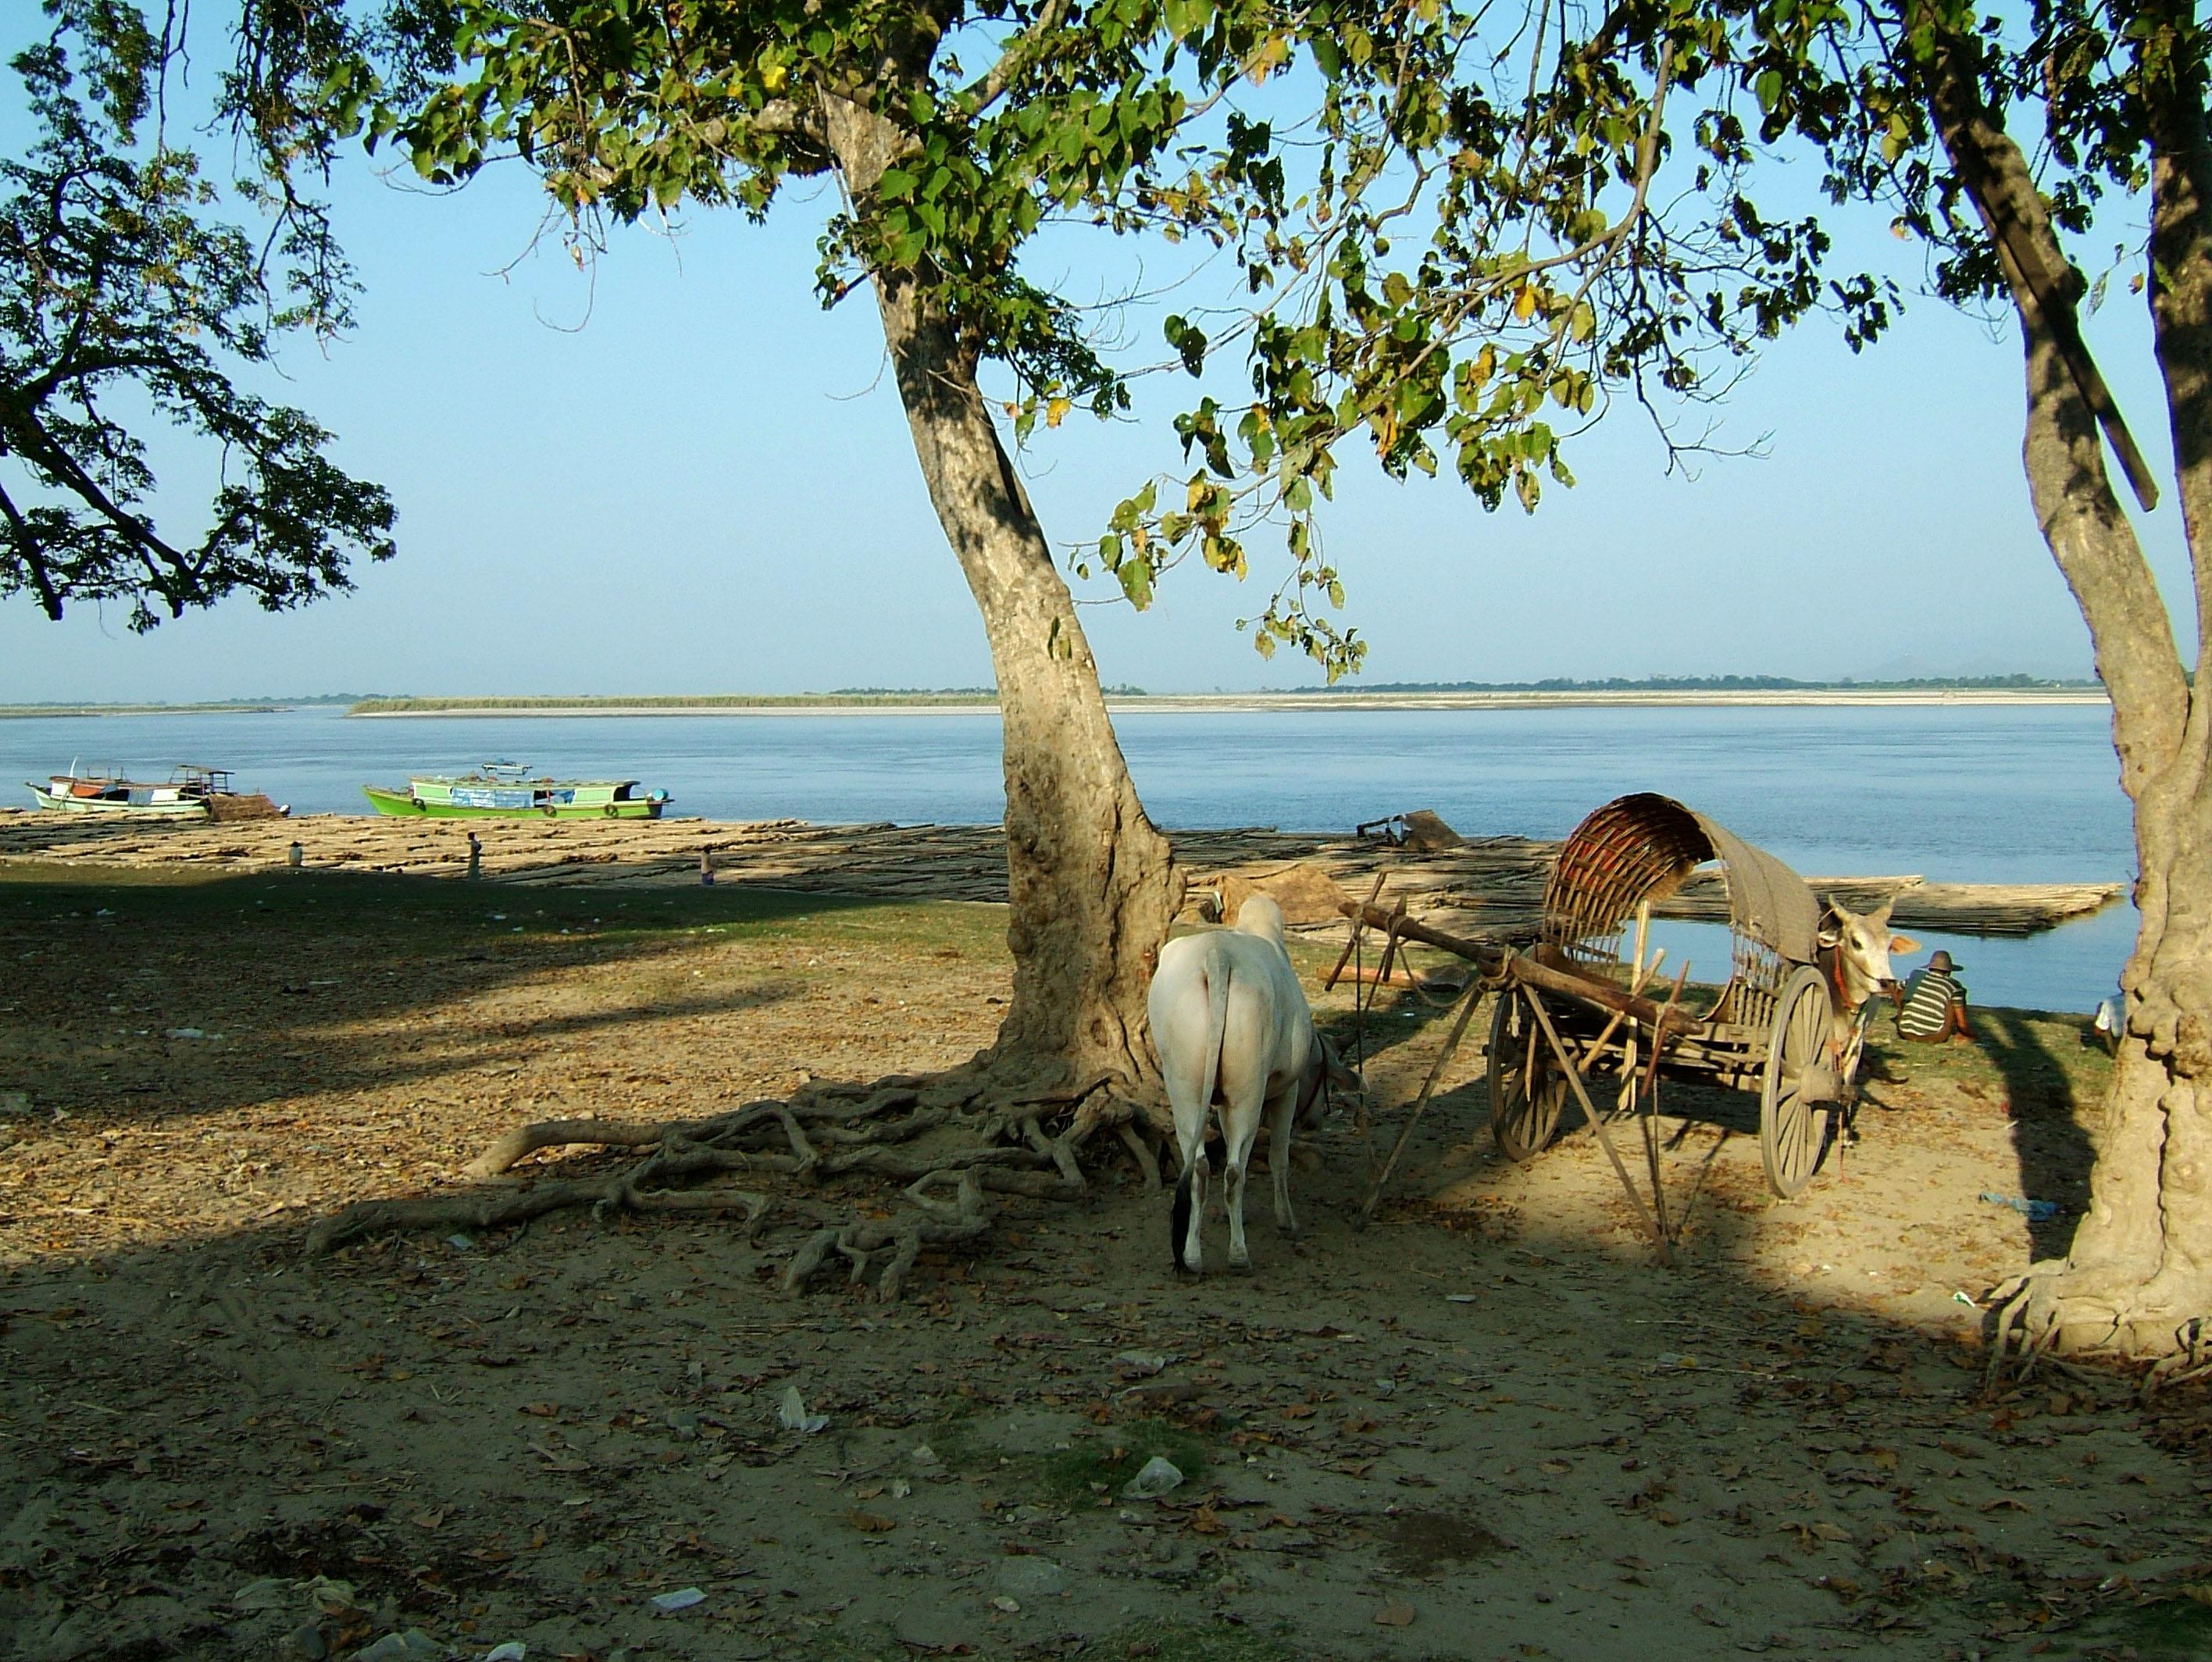 Ayeyarwaddy river scenes Mingun area Nov 2004 10